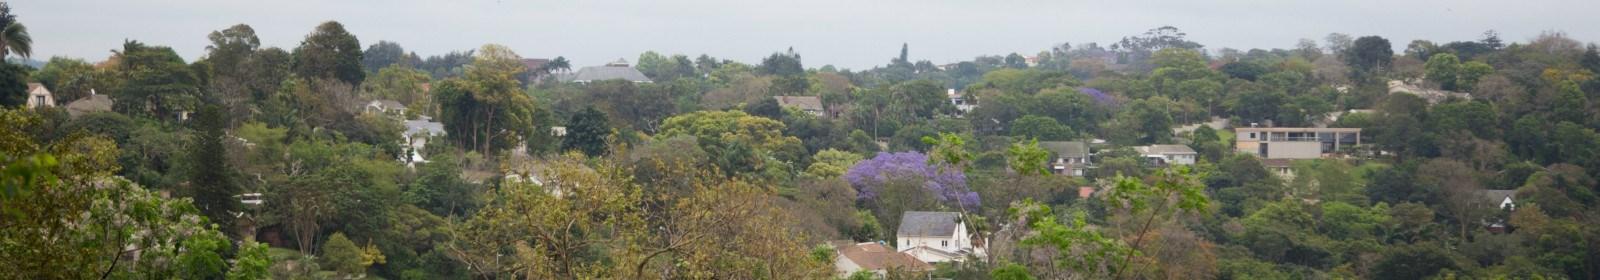 What it's like living in Westville, Durban